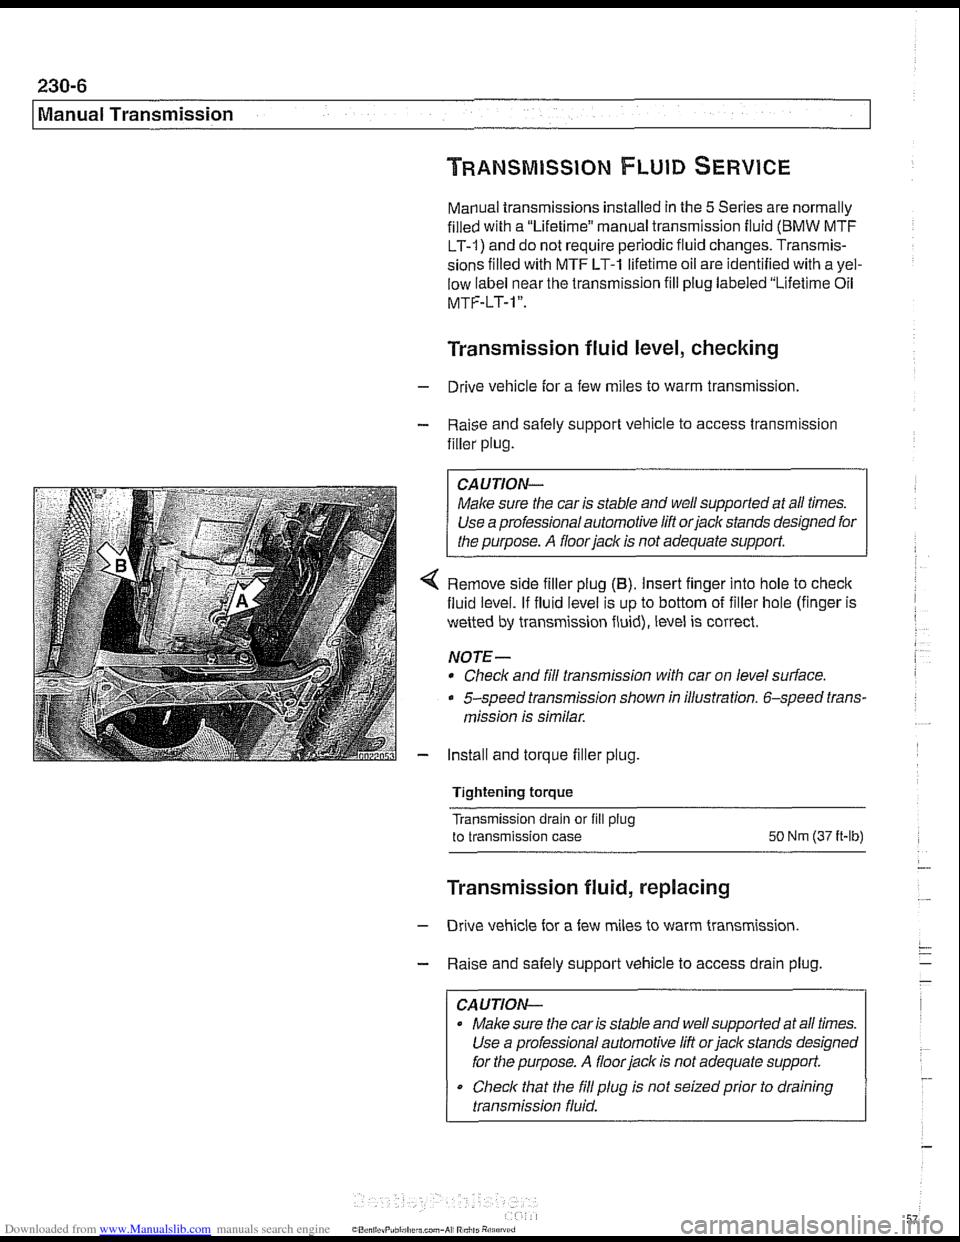 mtf lt 2 manual transmission fluid